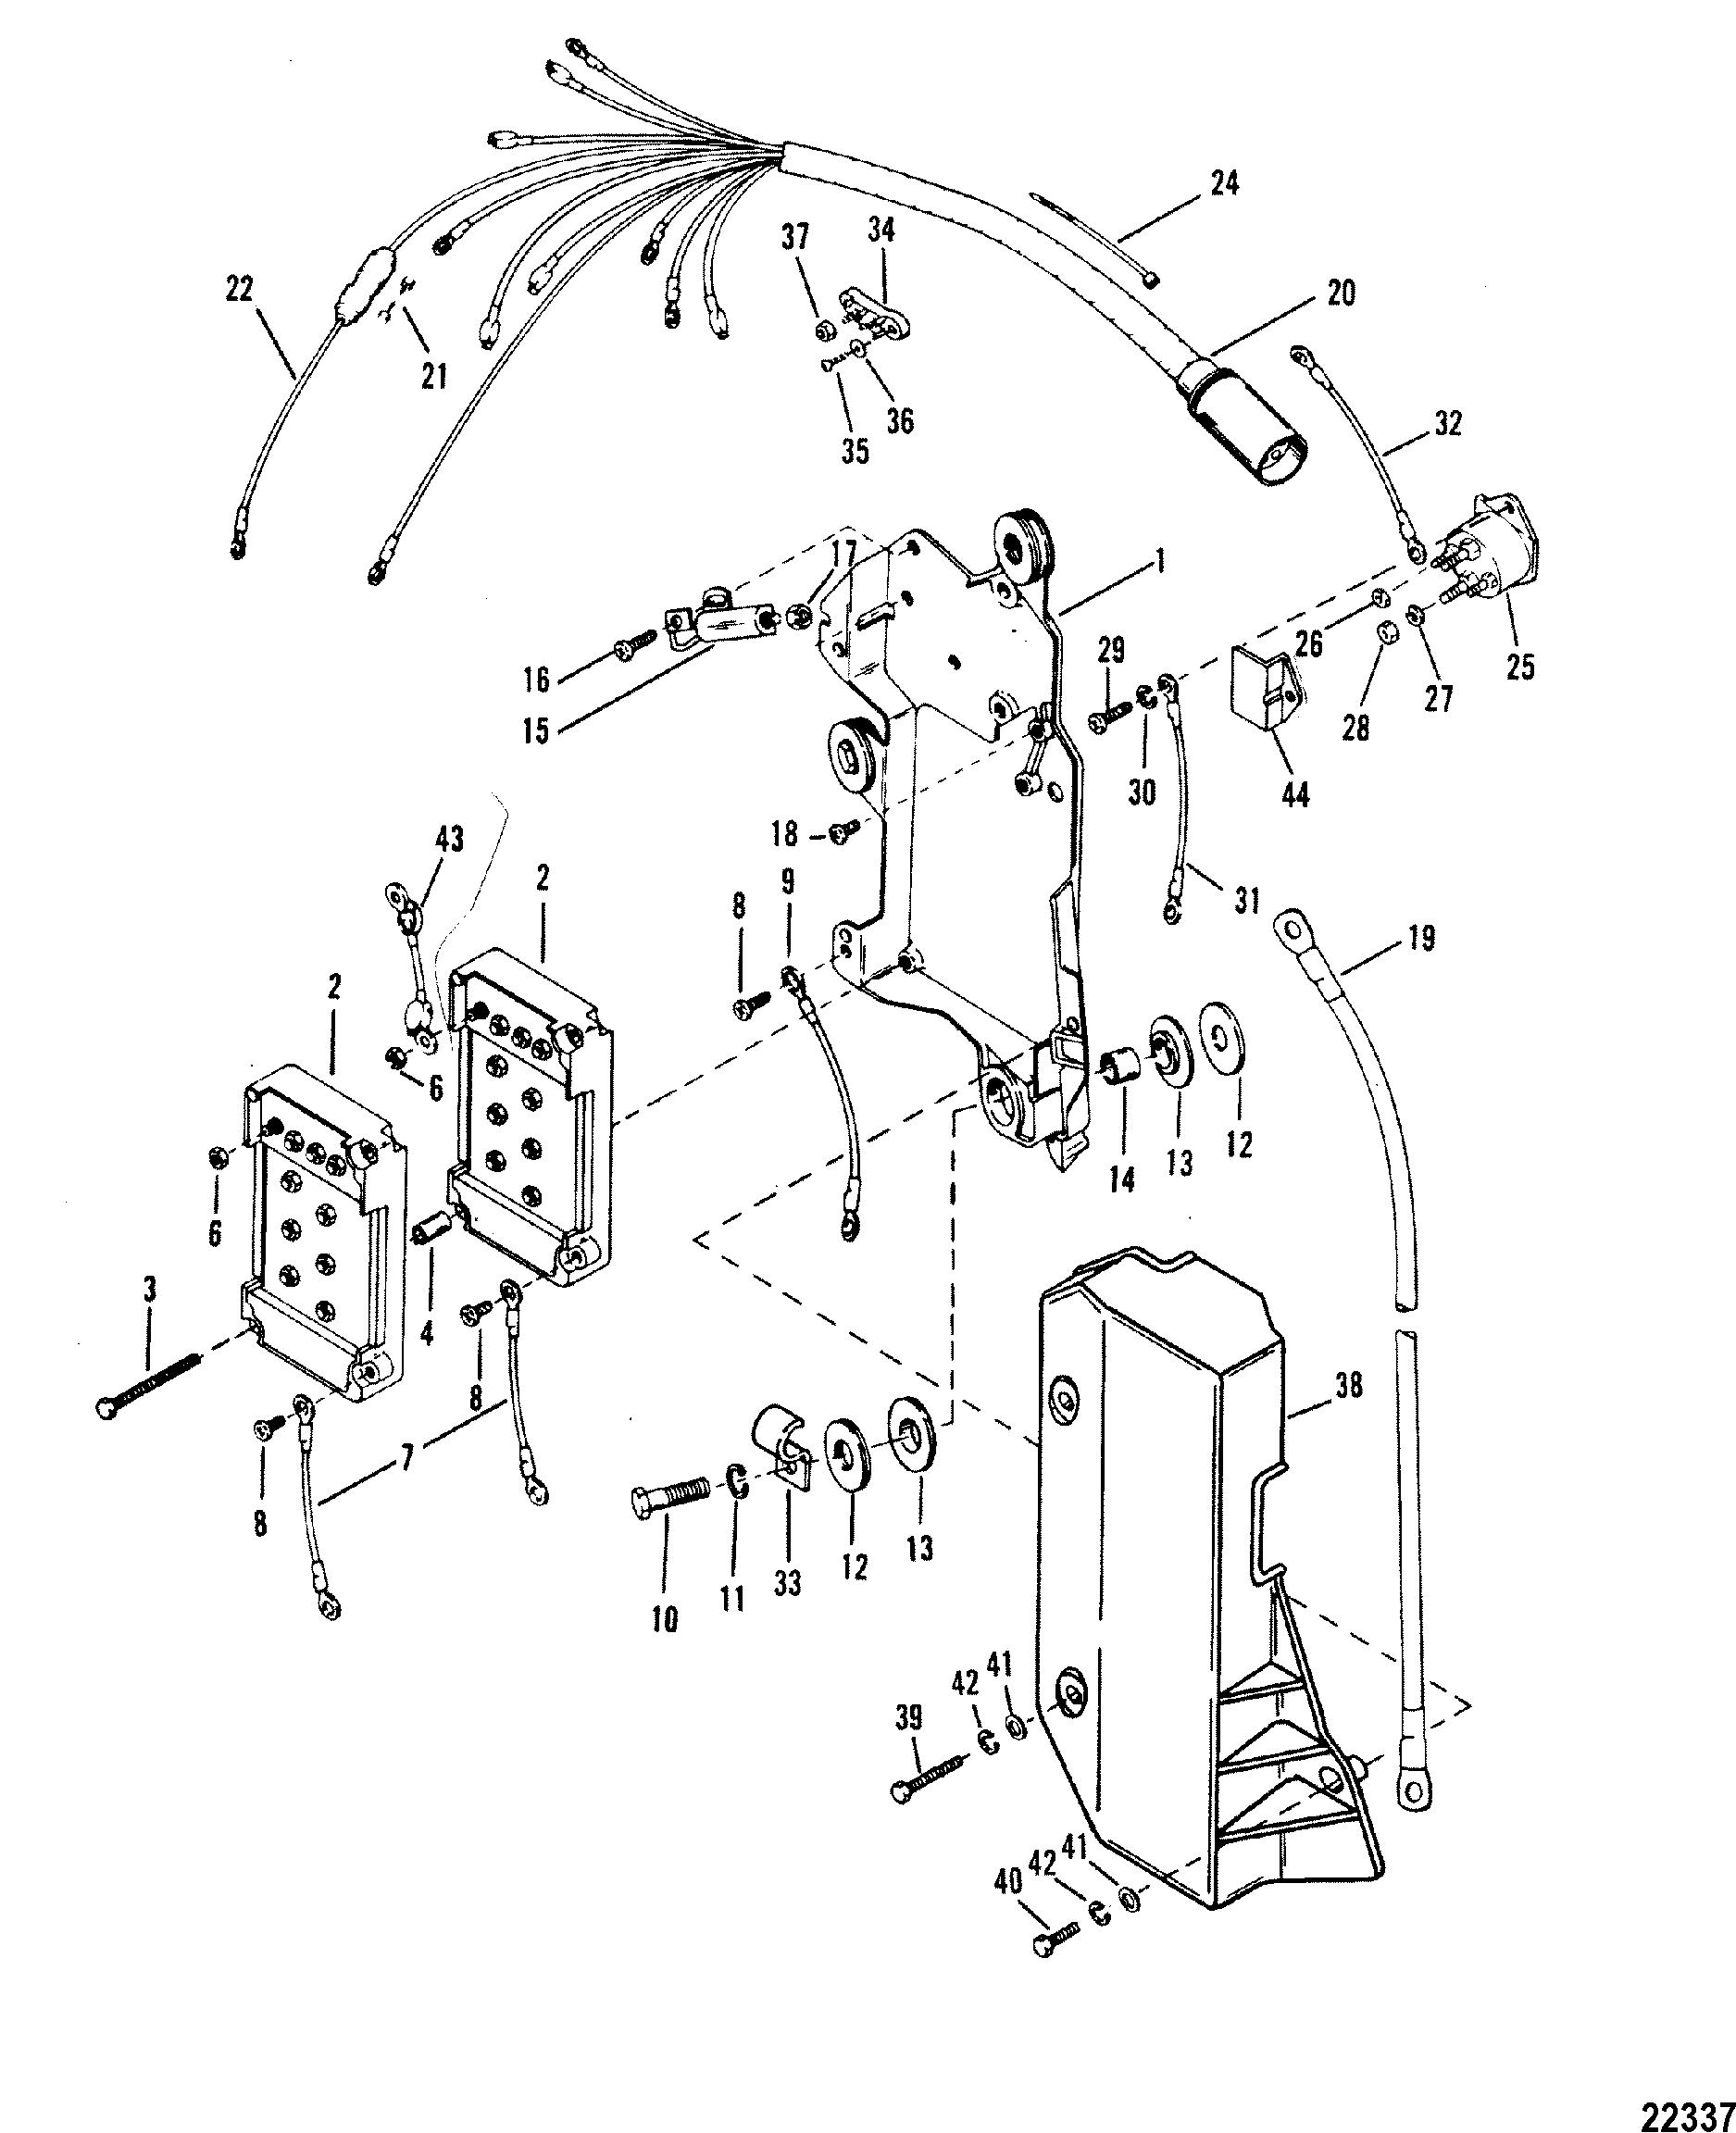 1993 evinrude 50 wiring diagram   31 wiring diagram images